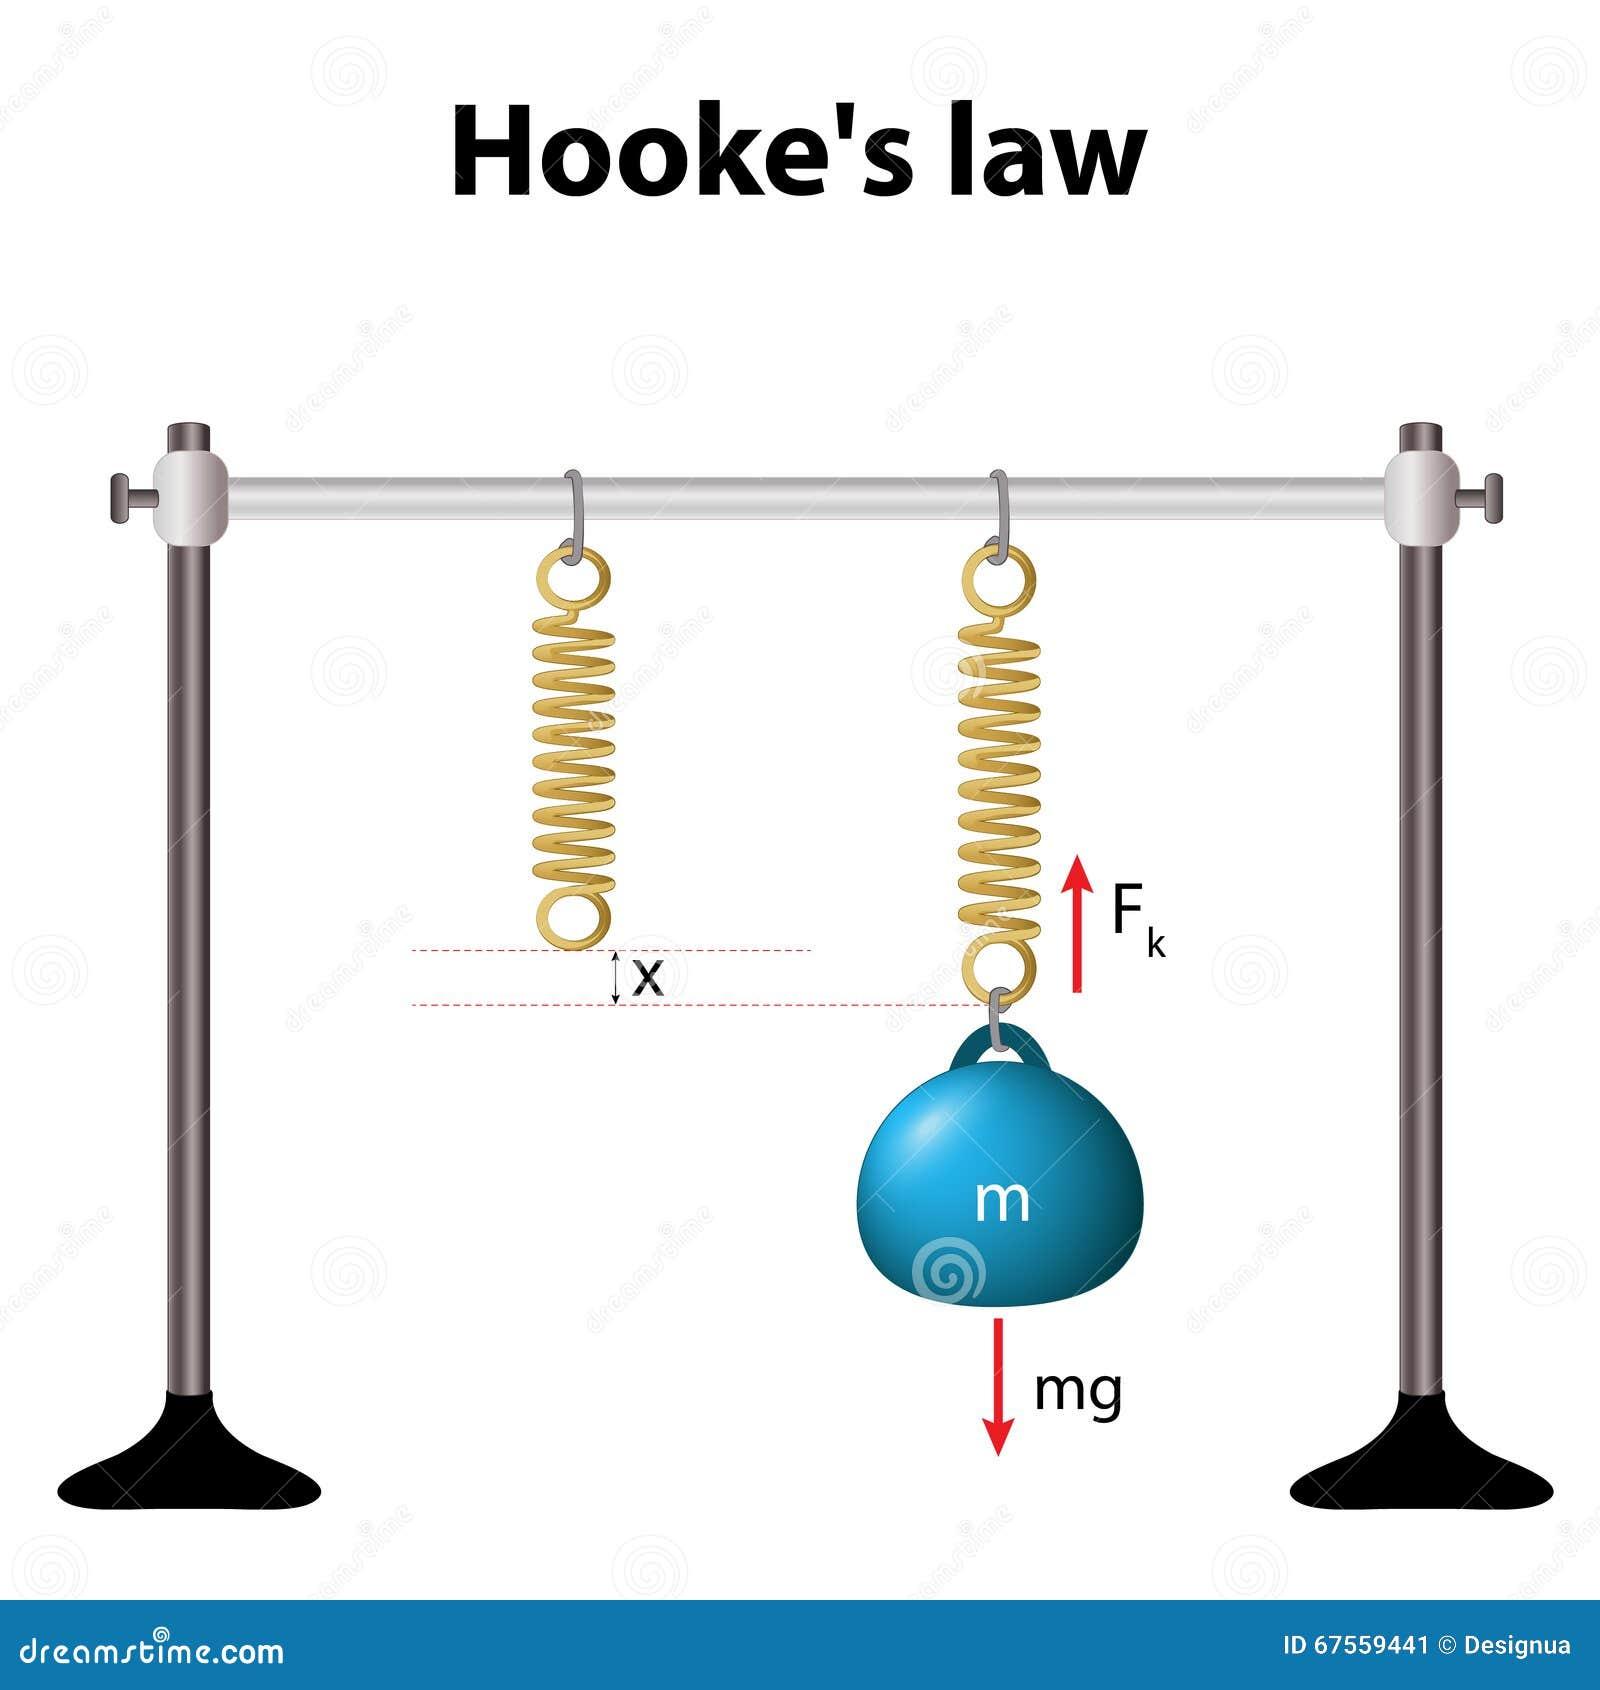 A lei de Hooke a força é proporcional à extensão